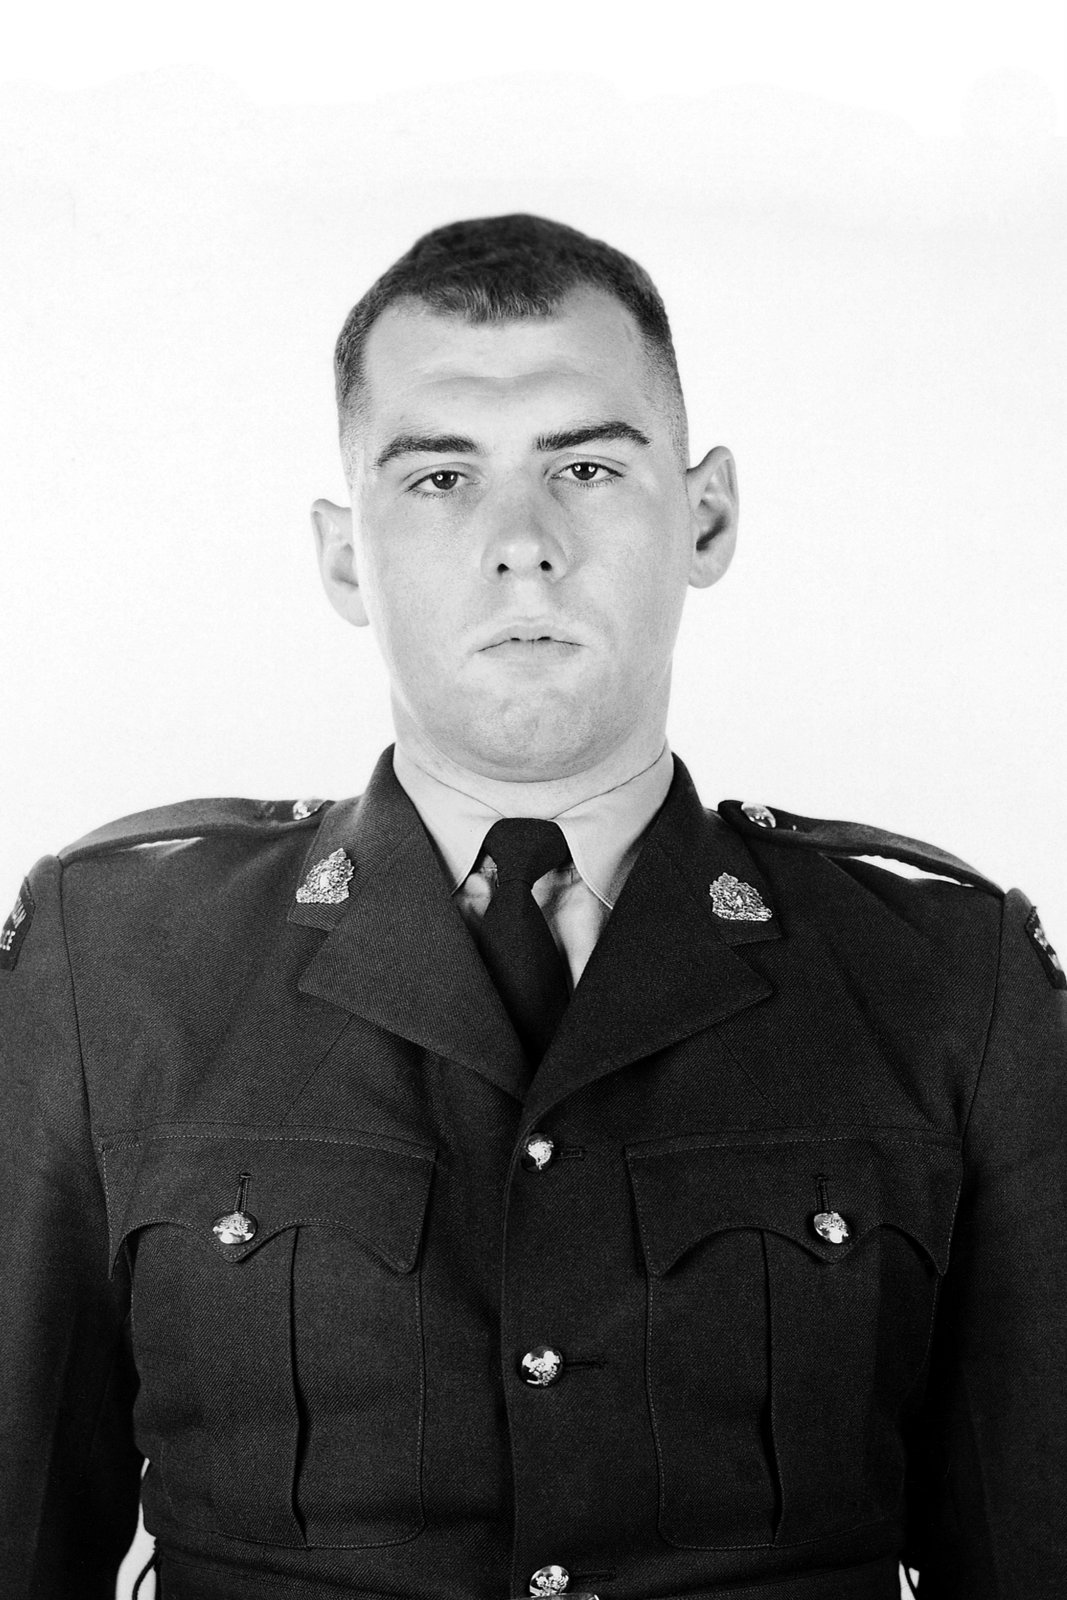 Third Class Constable Reginald Wayne Williams